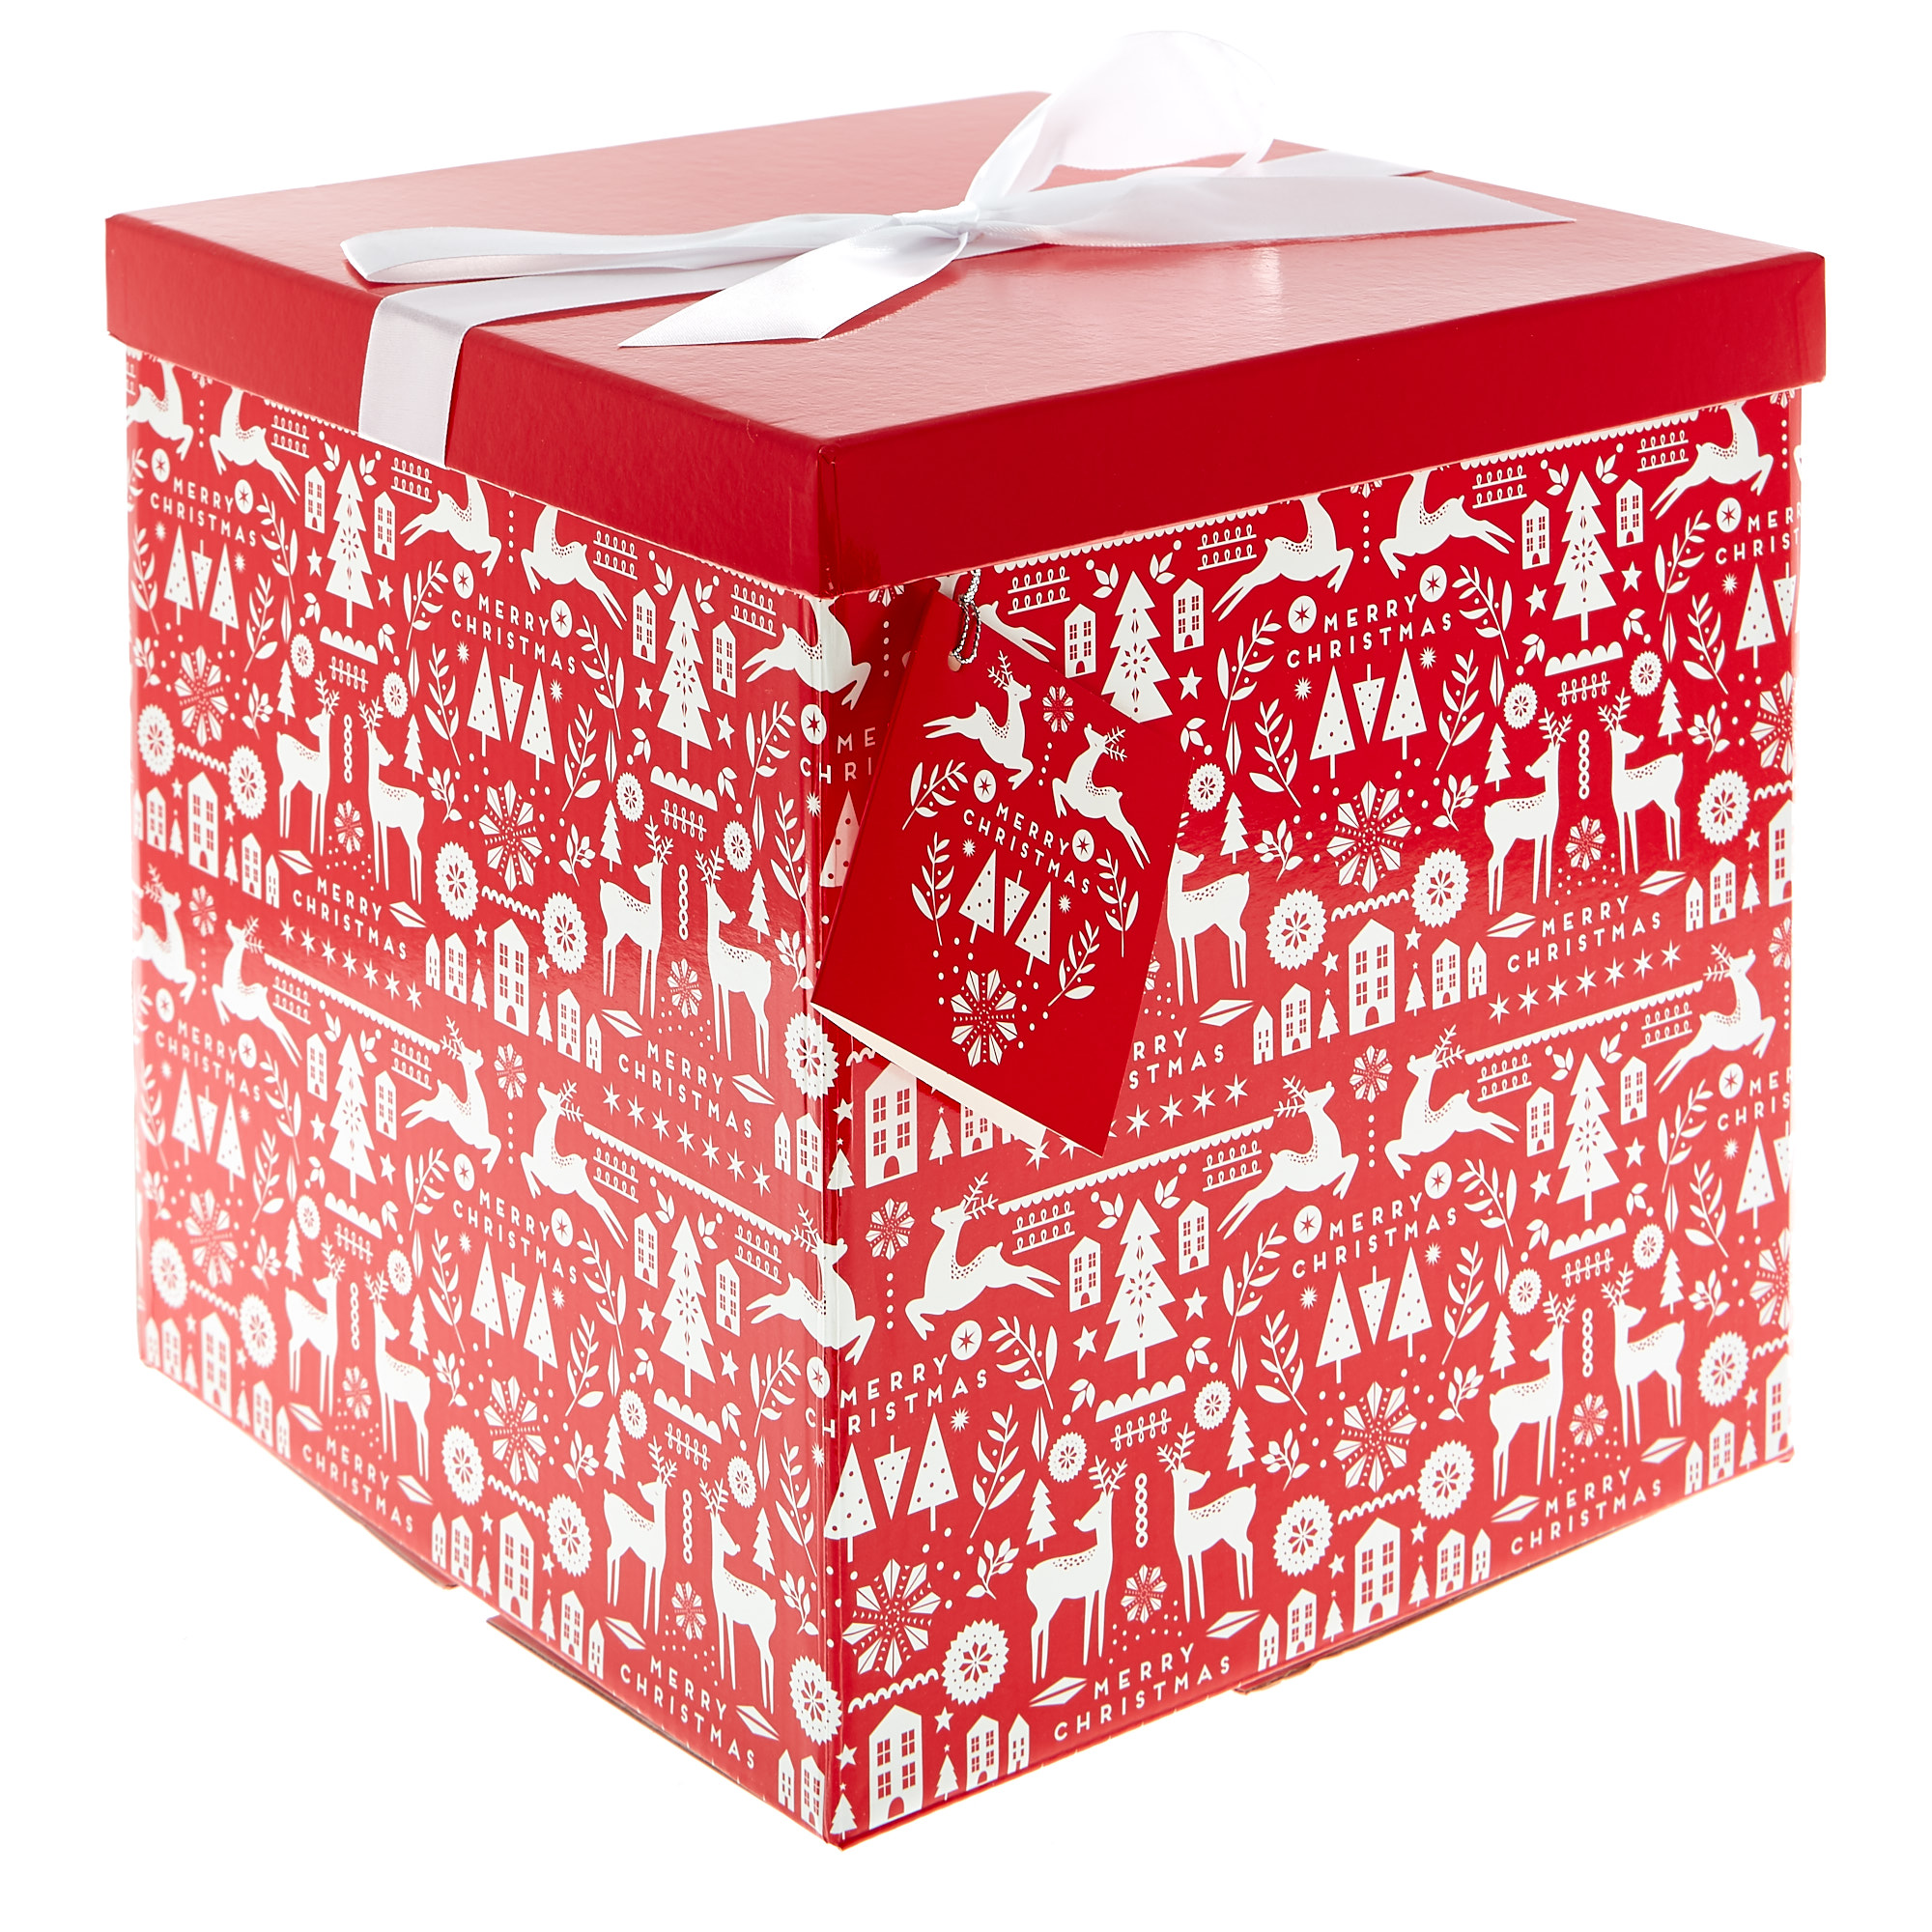 Extra gift box